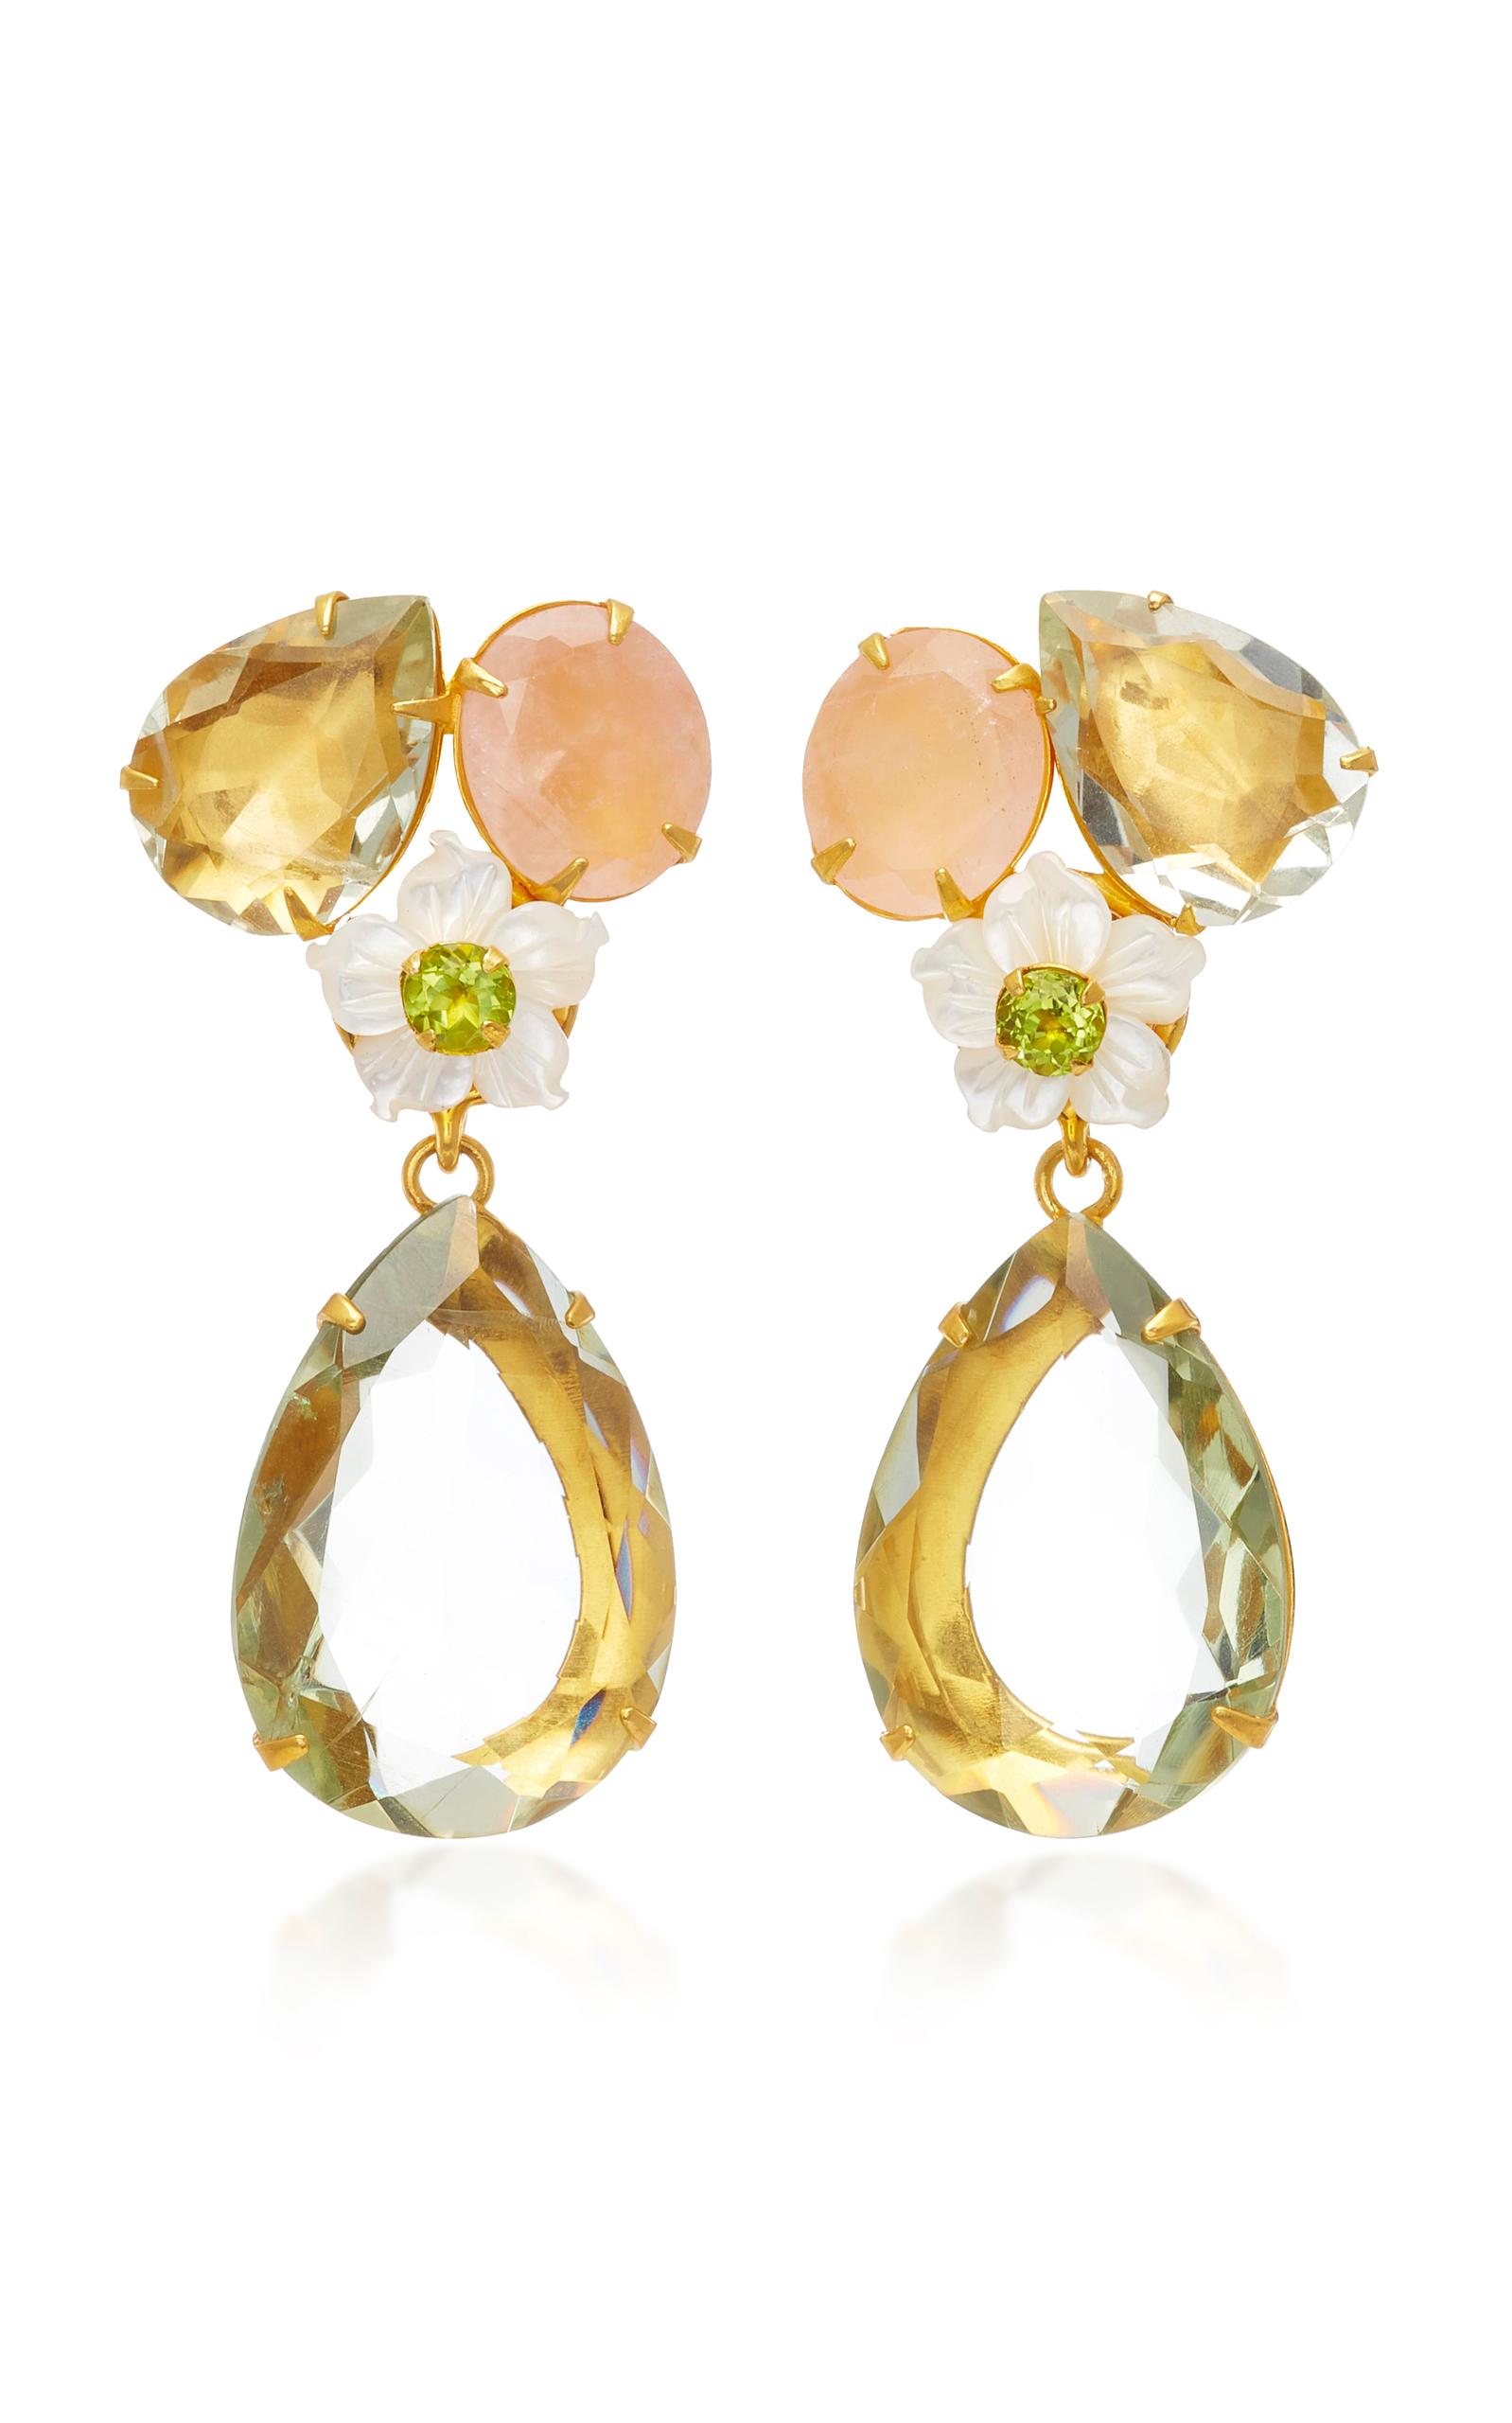 BOUNKIT 14K GOLD-PLATED BRASS ROSE QUARTZ GREEN AMETHYST WHITE MOTHER OF PEARL EARRINGS